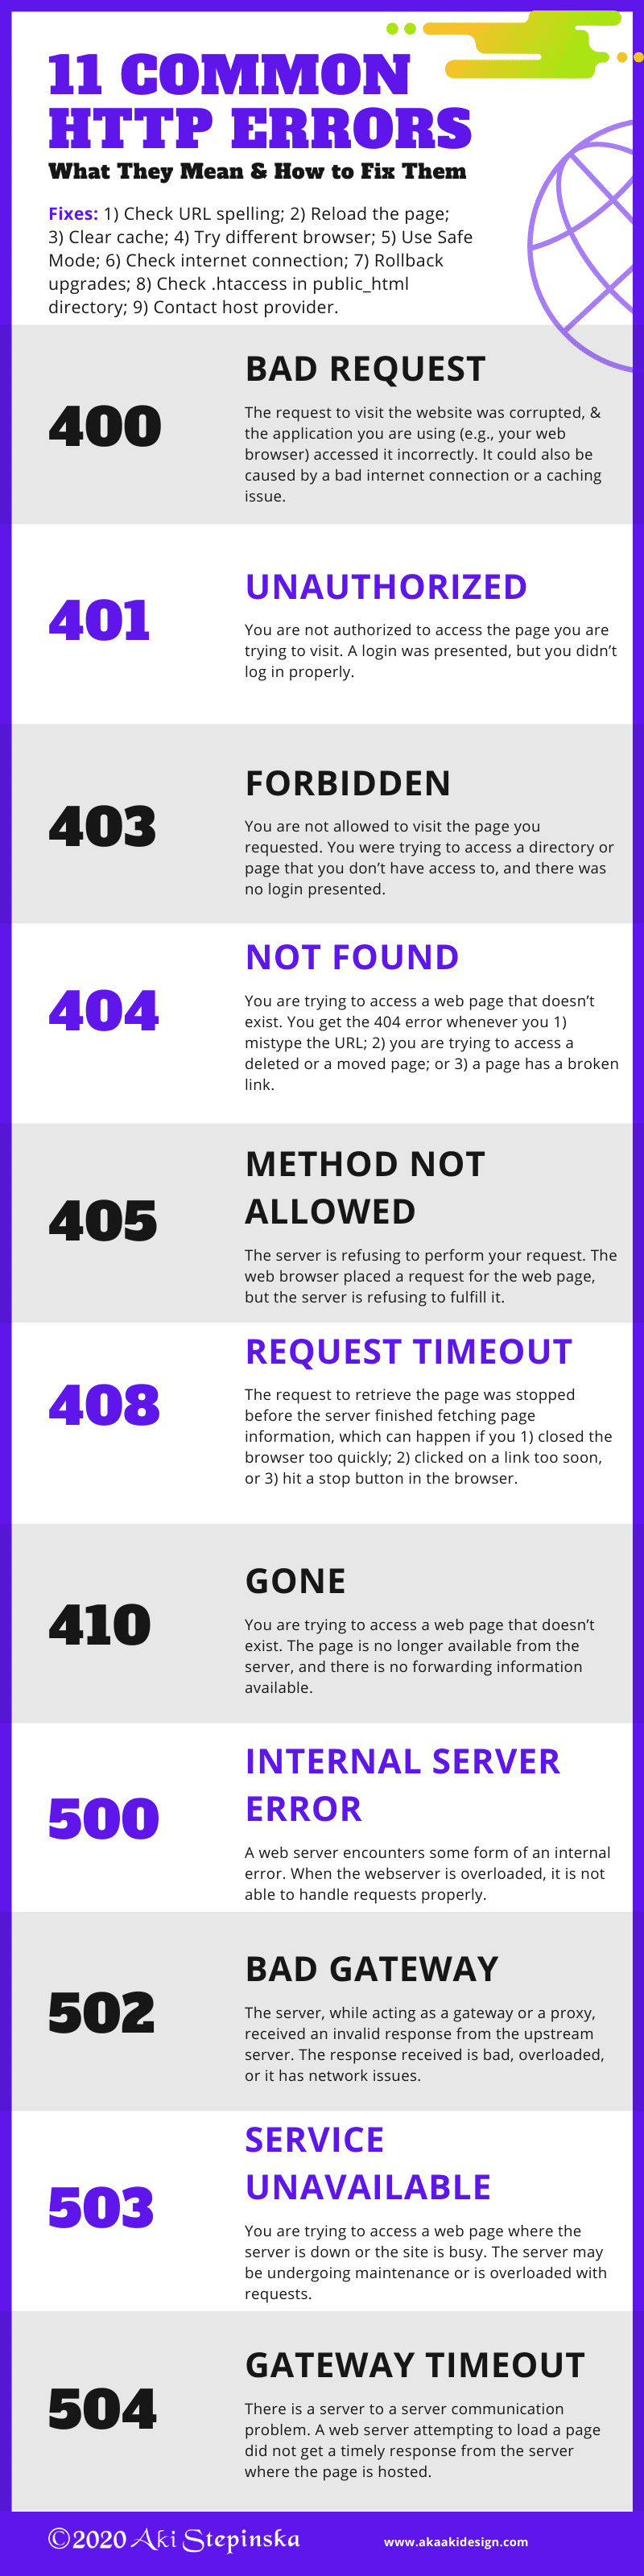 11 Common HTTP Errors